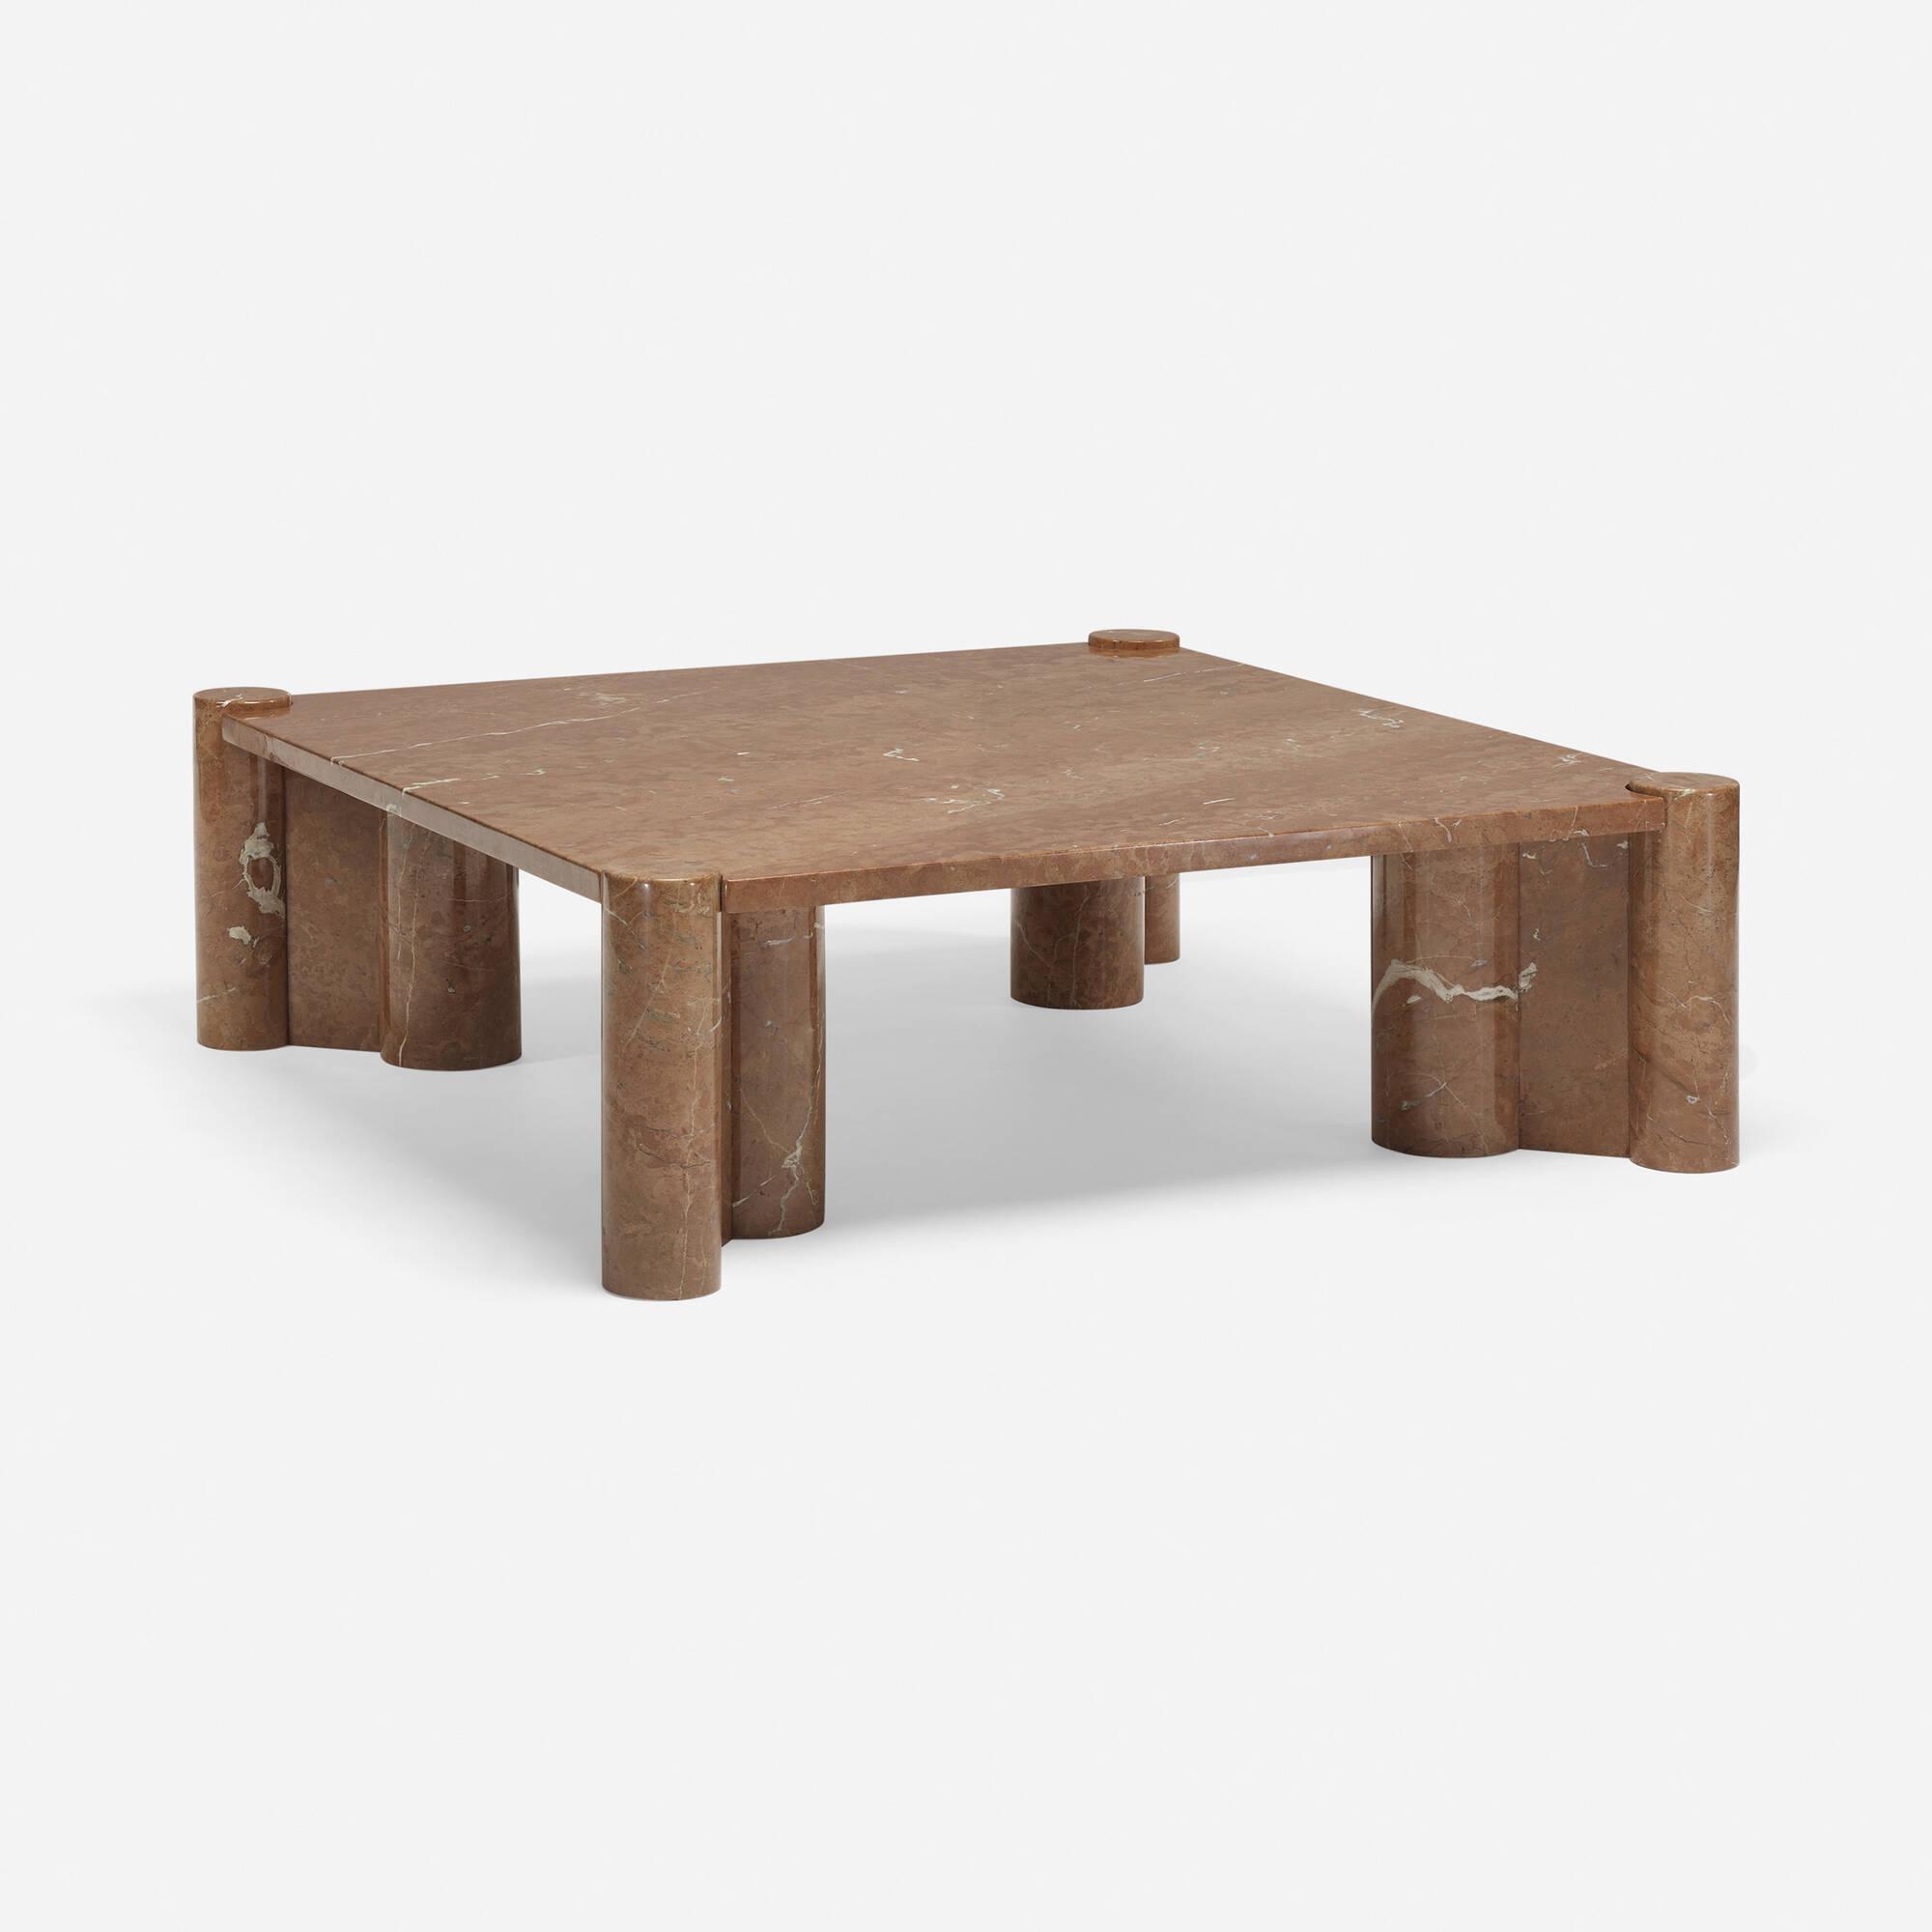 402 Gae Aulenti Jumbo coffee table Design 26 March 2015